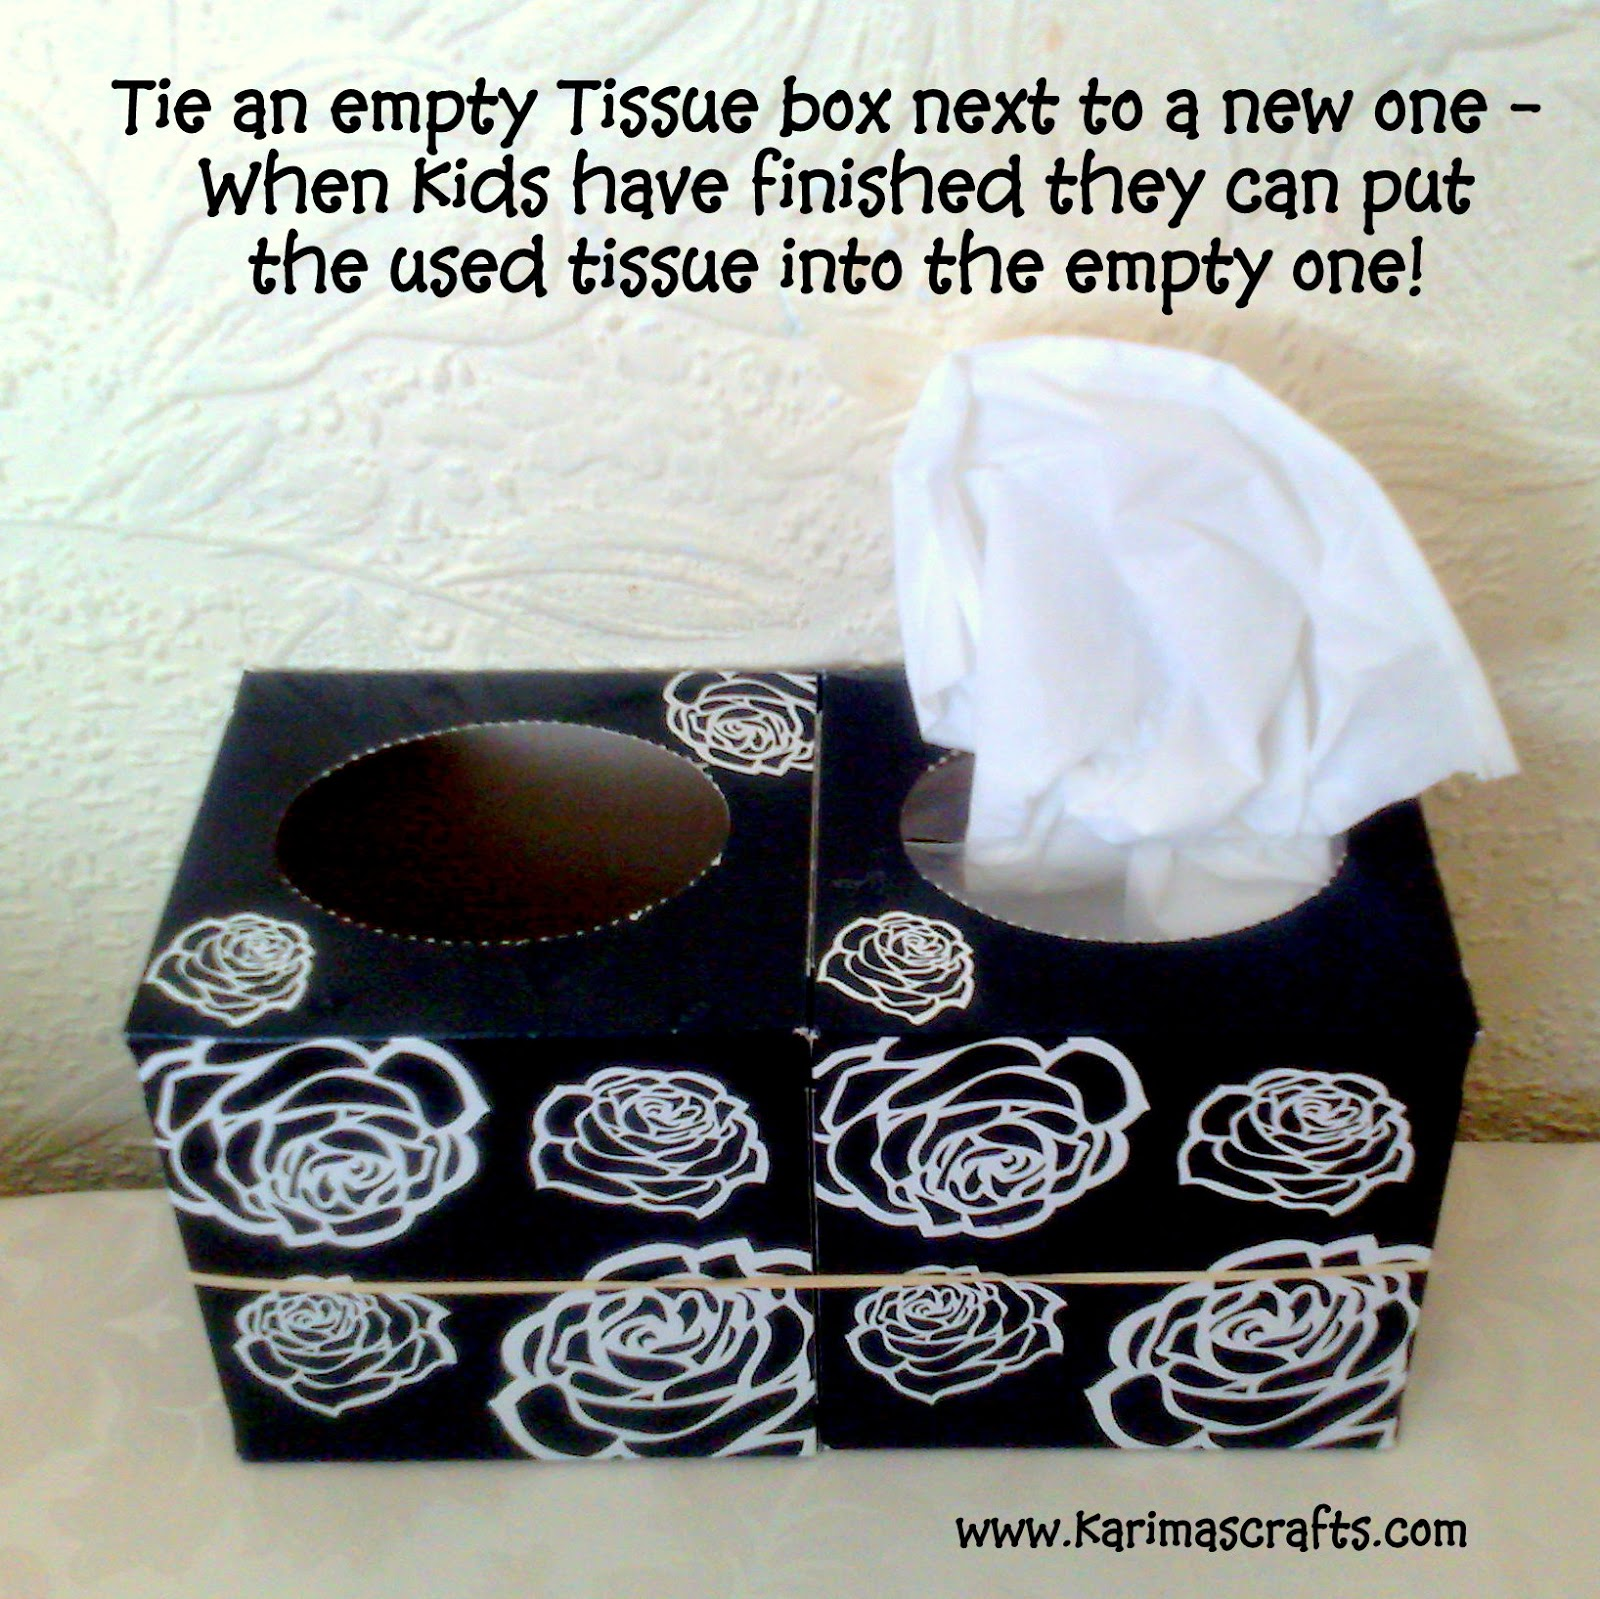 Used Tissues Bin great ideas muslim blog